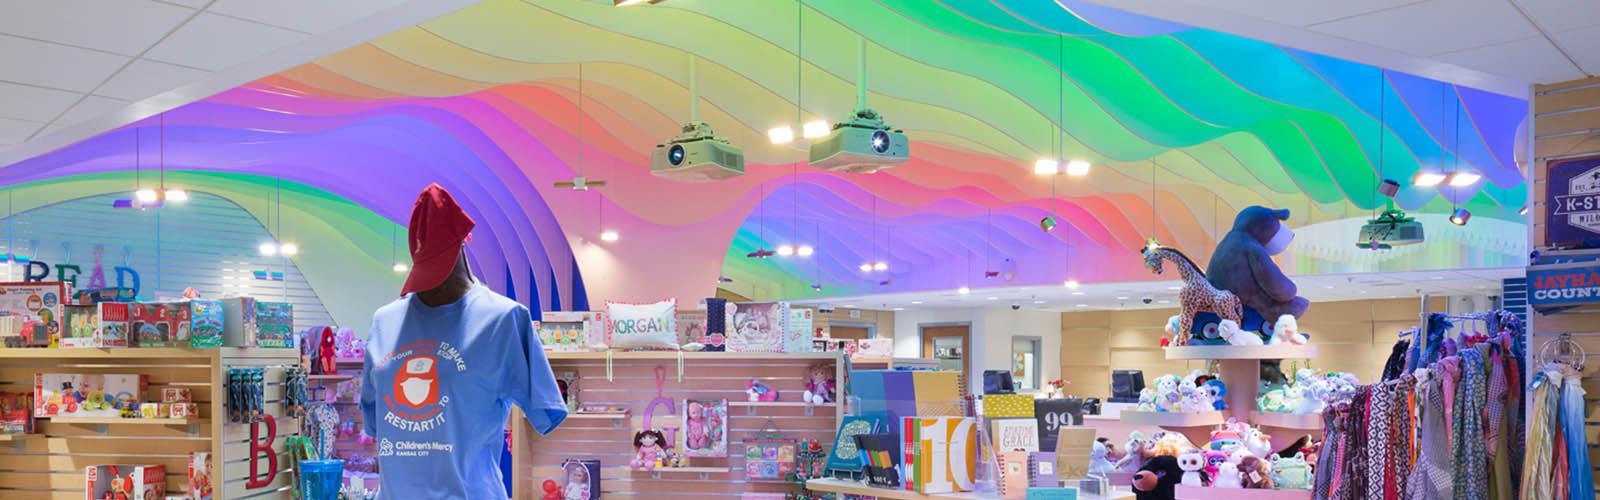 Award Winning Children's Mercy Hospital Gift Shop